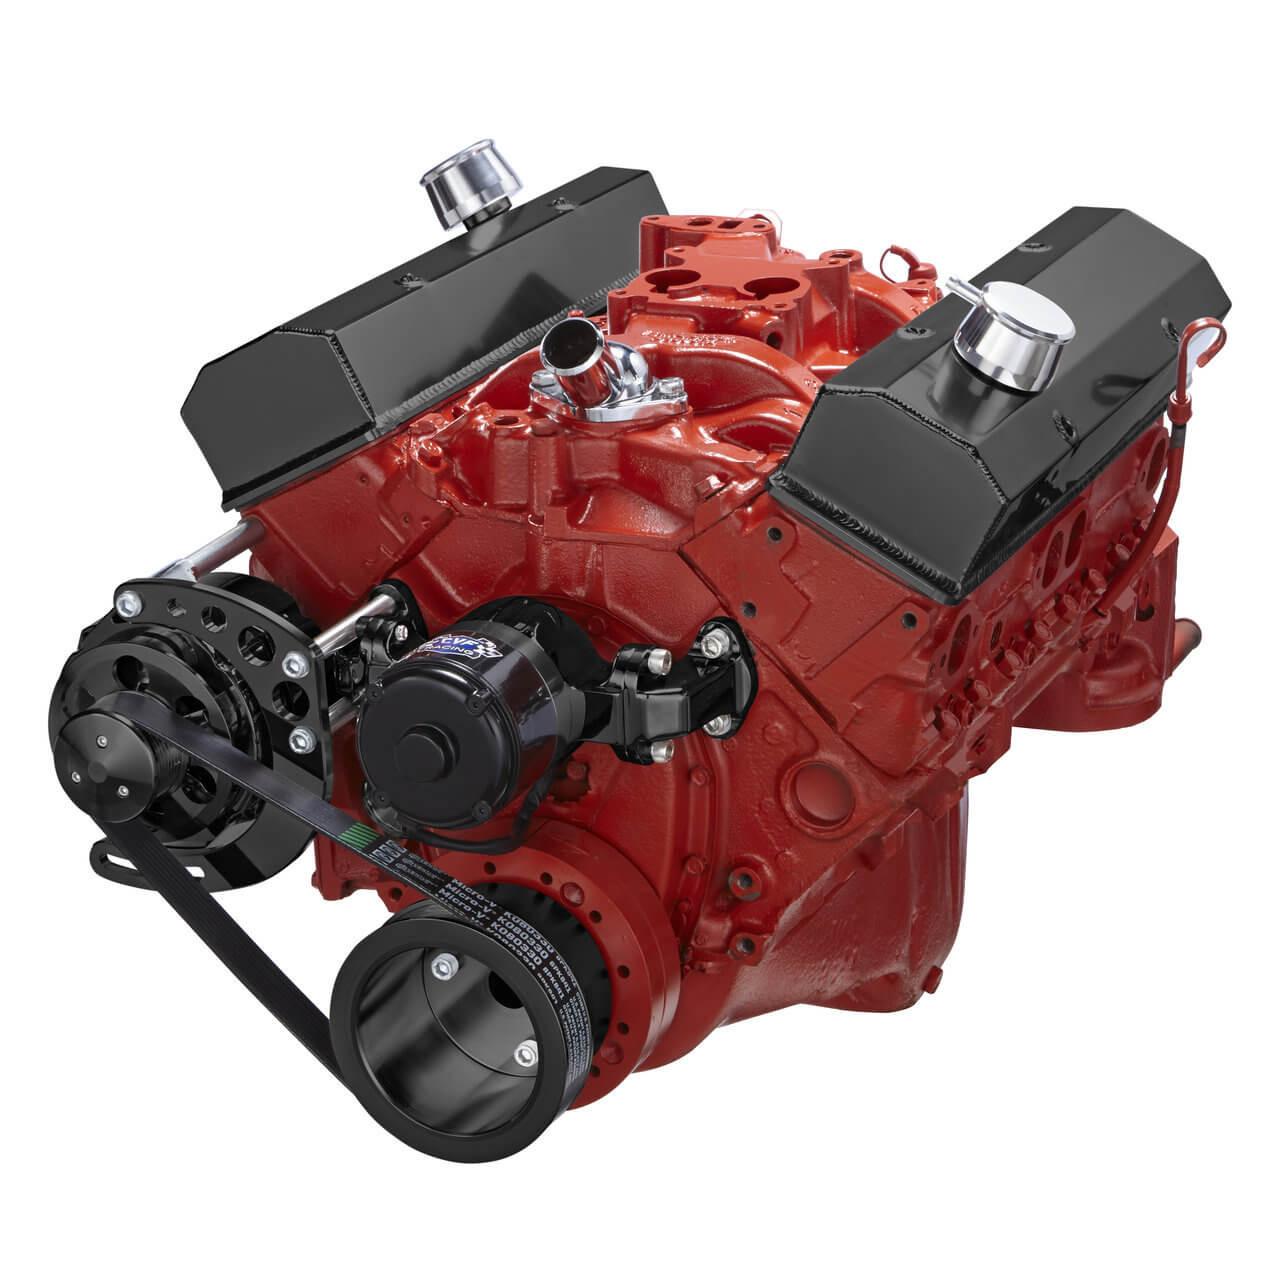 Denso Alternator Wiring Diagram On F150 Power Steering Pump Diagram